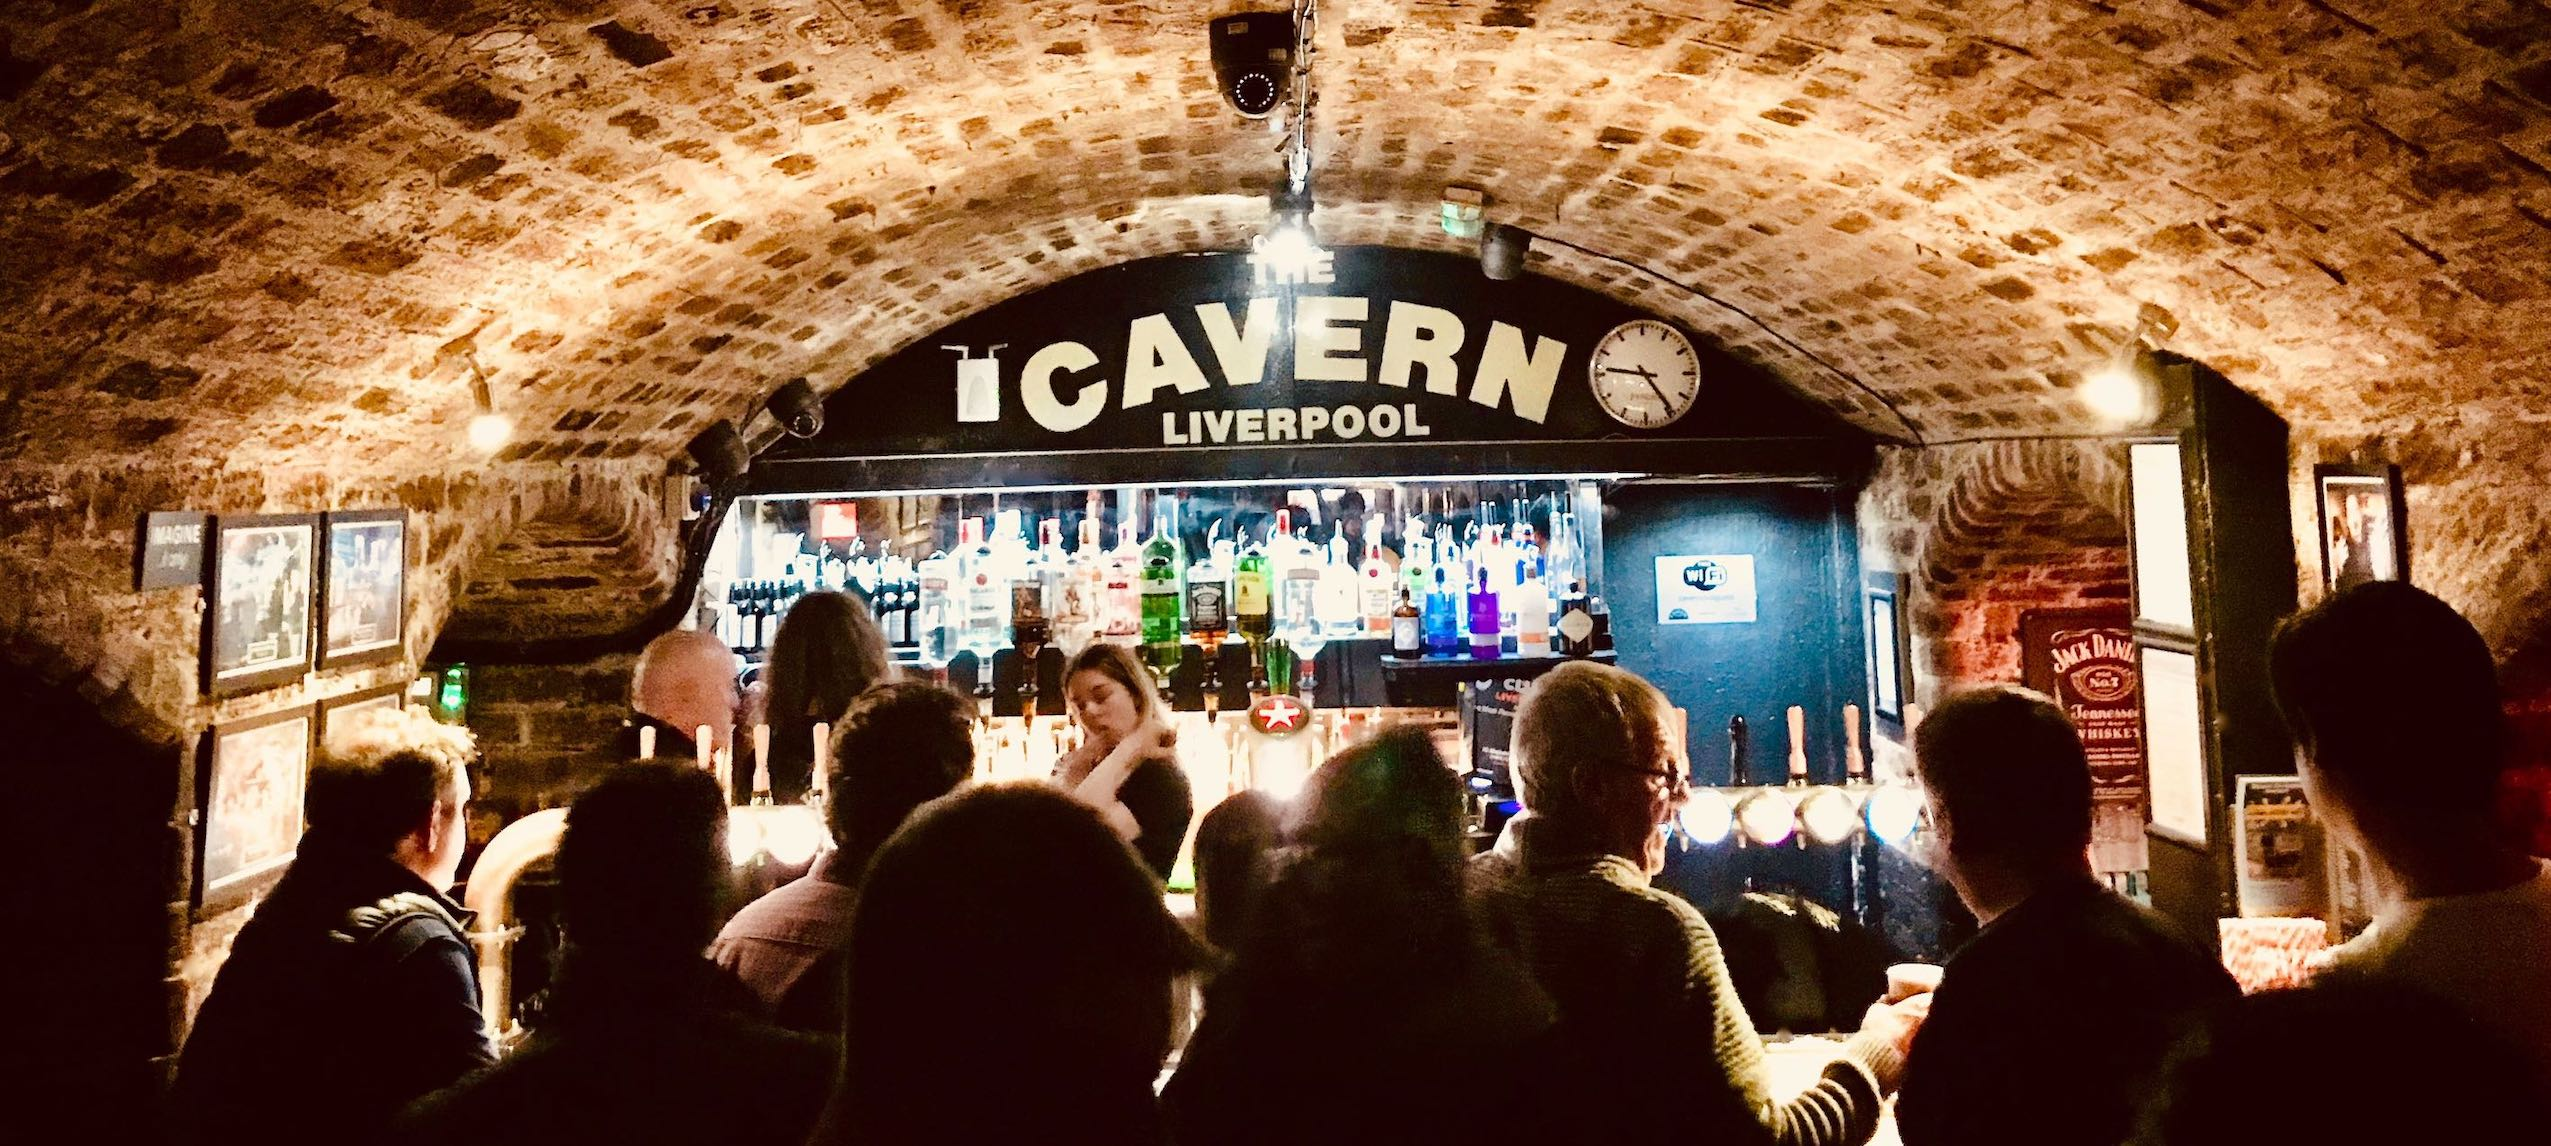 The Cavern Club Liverpool.